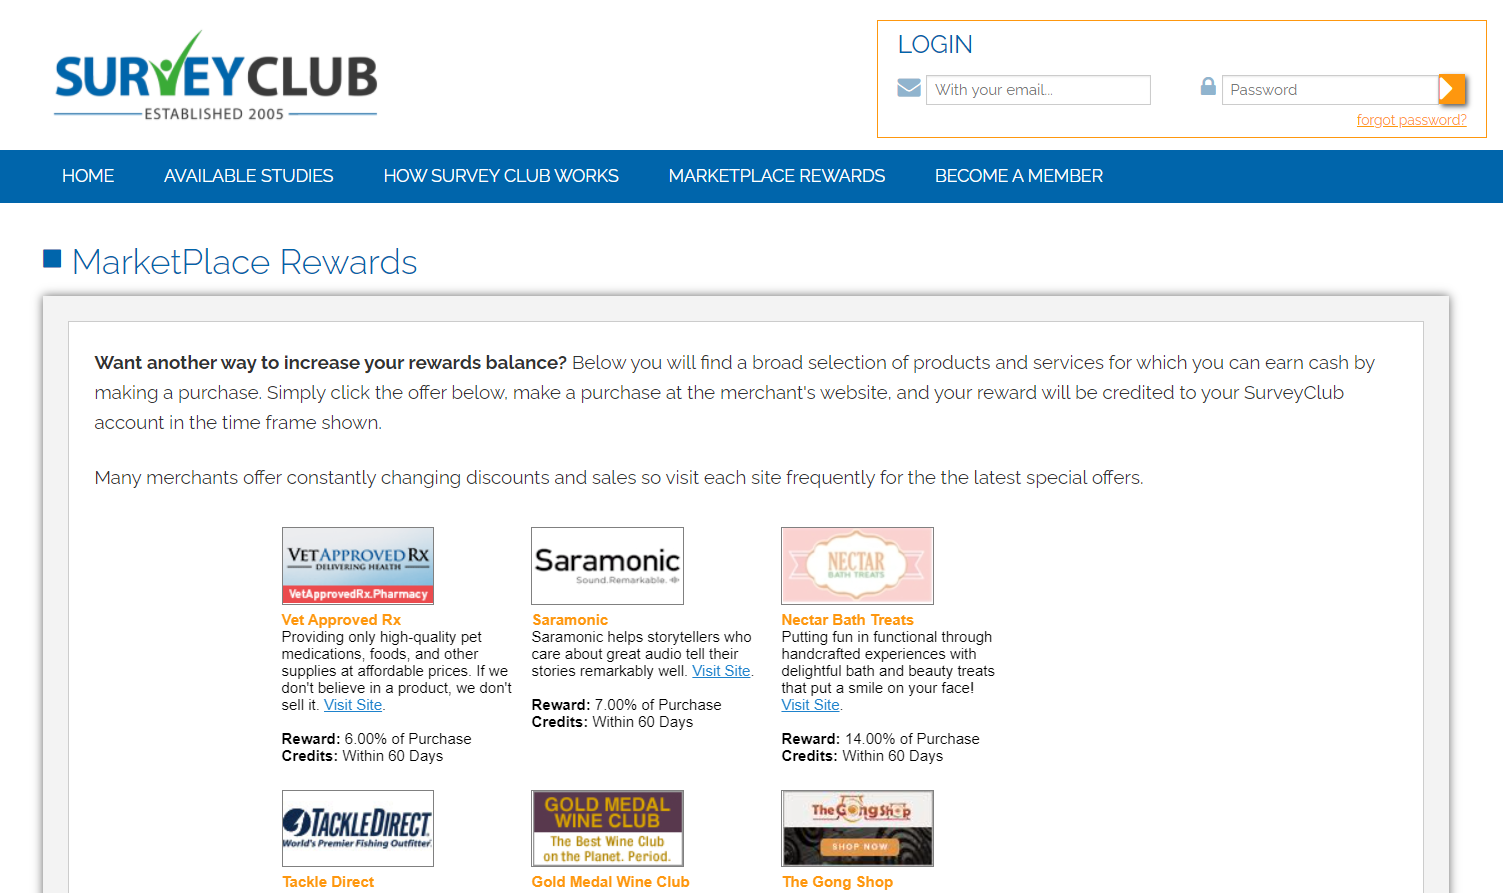 SurveyClub Rewards Marketplace